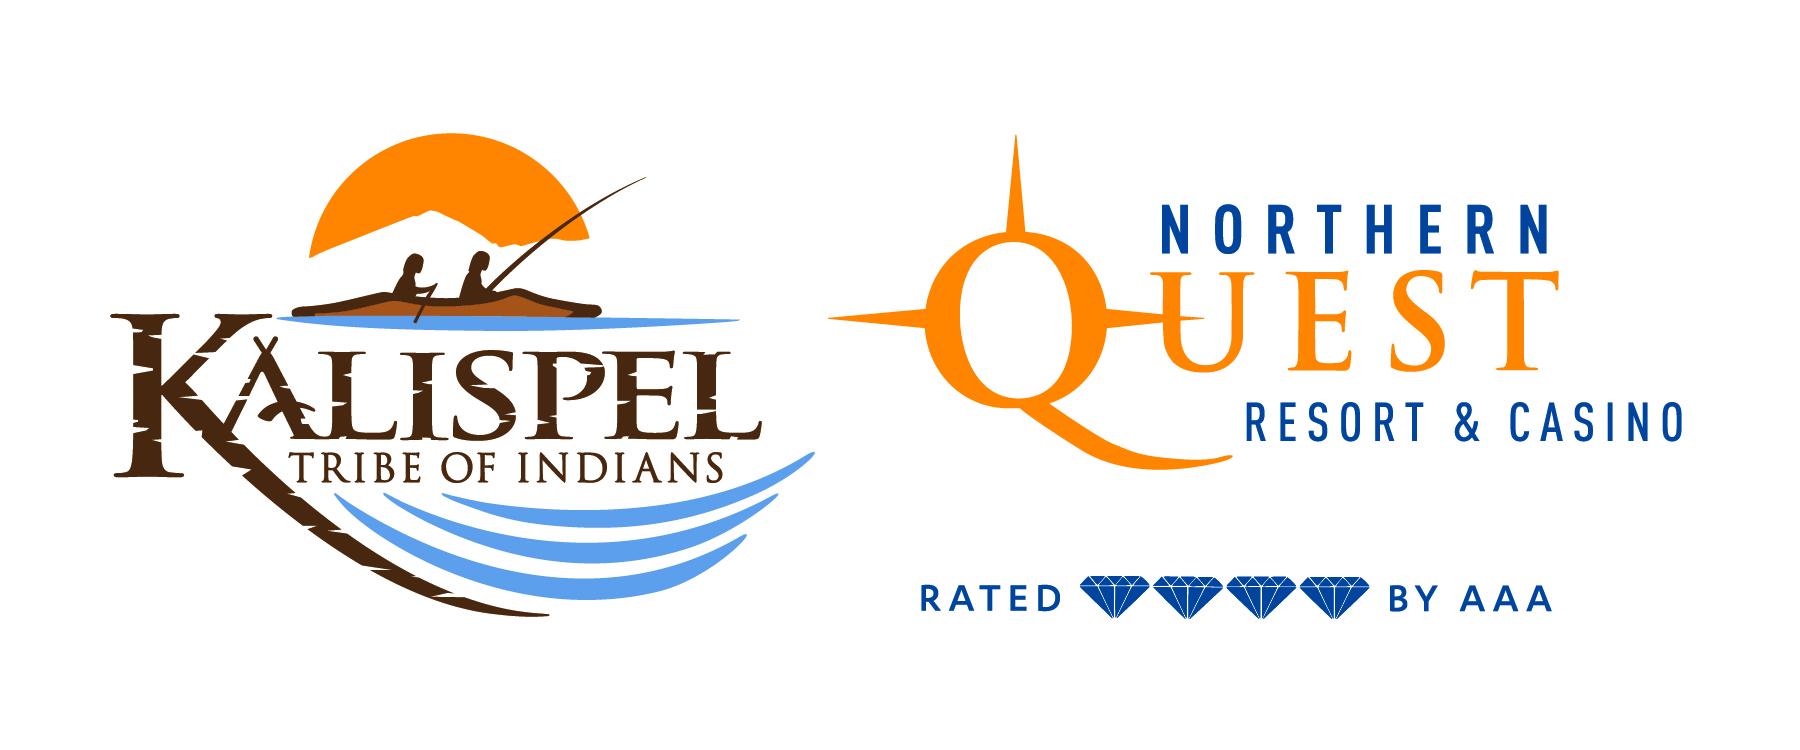 Kalispel_NQC_4_dmnd_logos